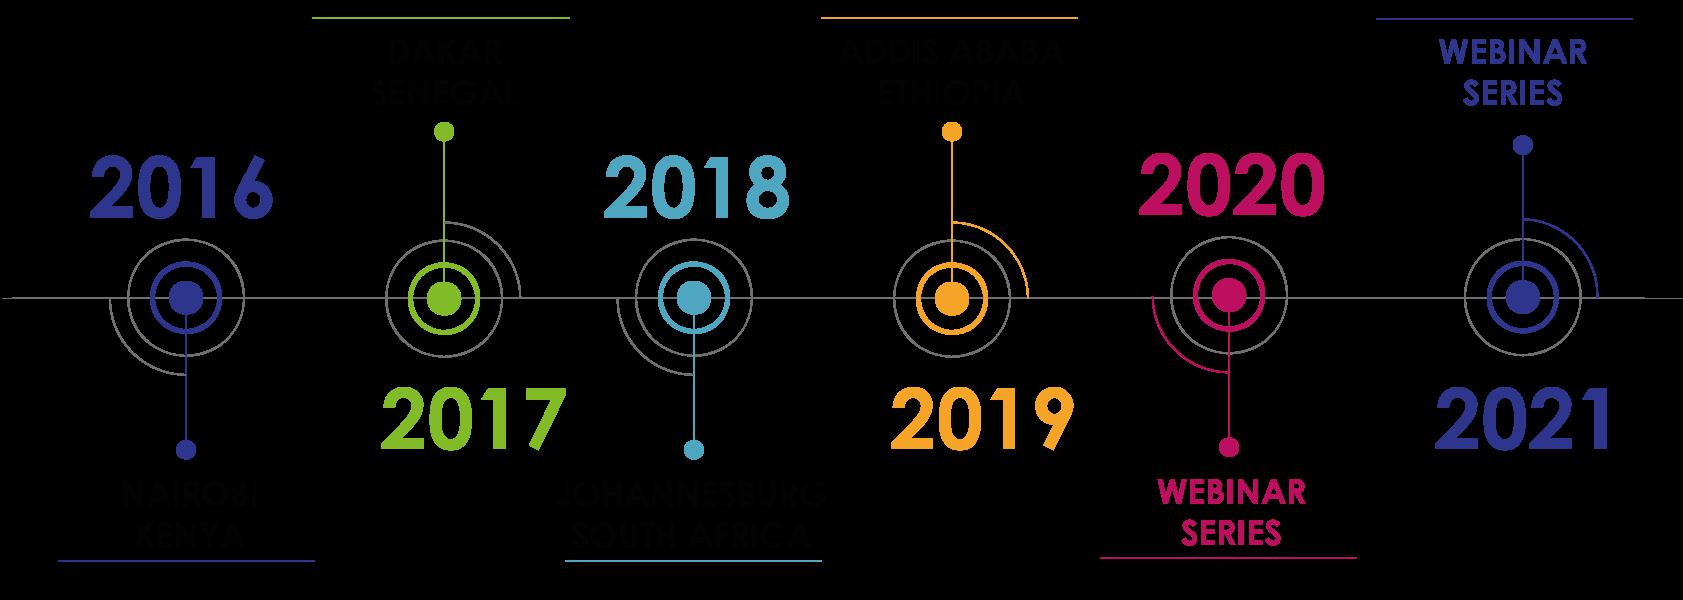 AHBS-TIMELINE 2021